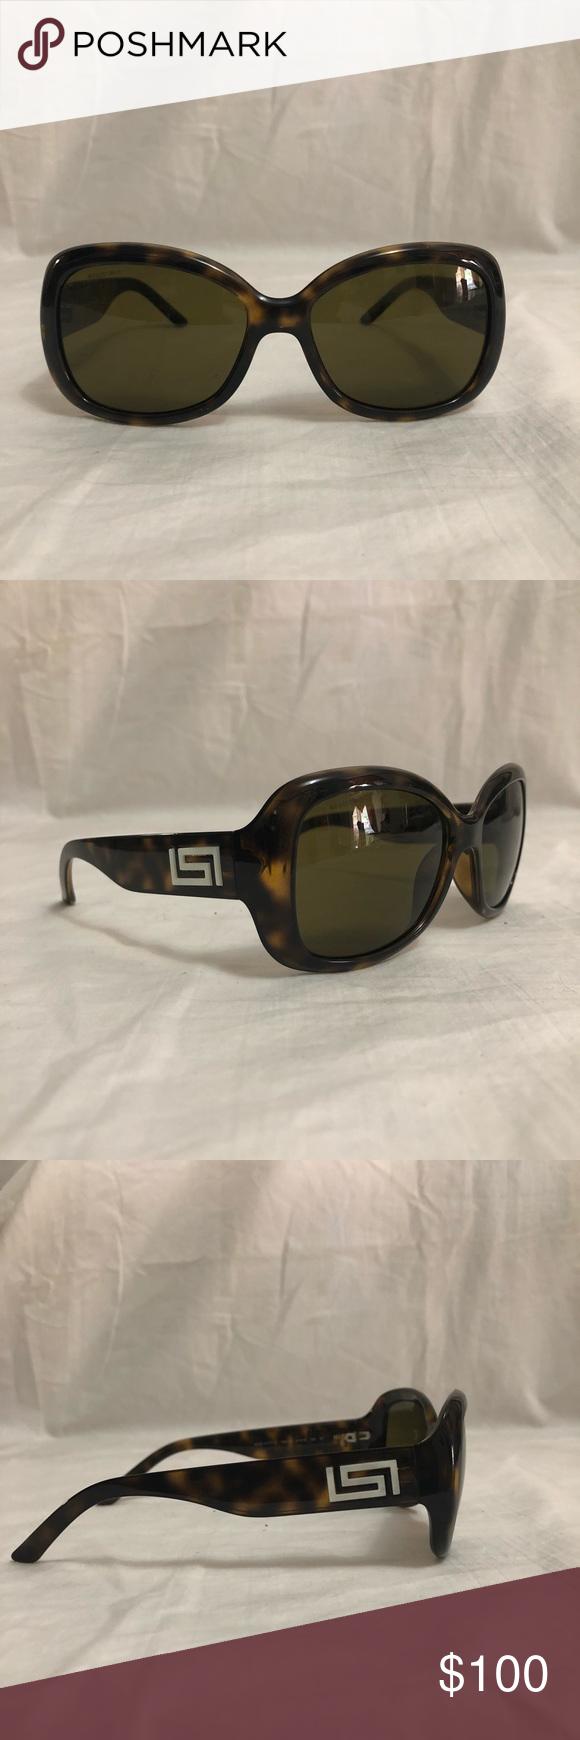 4f1e6a3cf96b Model  4177-H 108 73 Versace Accessories Sunglasses. Versace Dark Havana  Oval ...